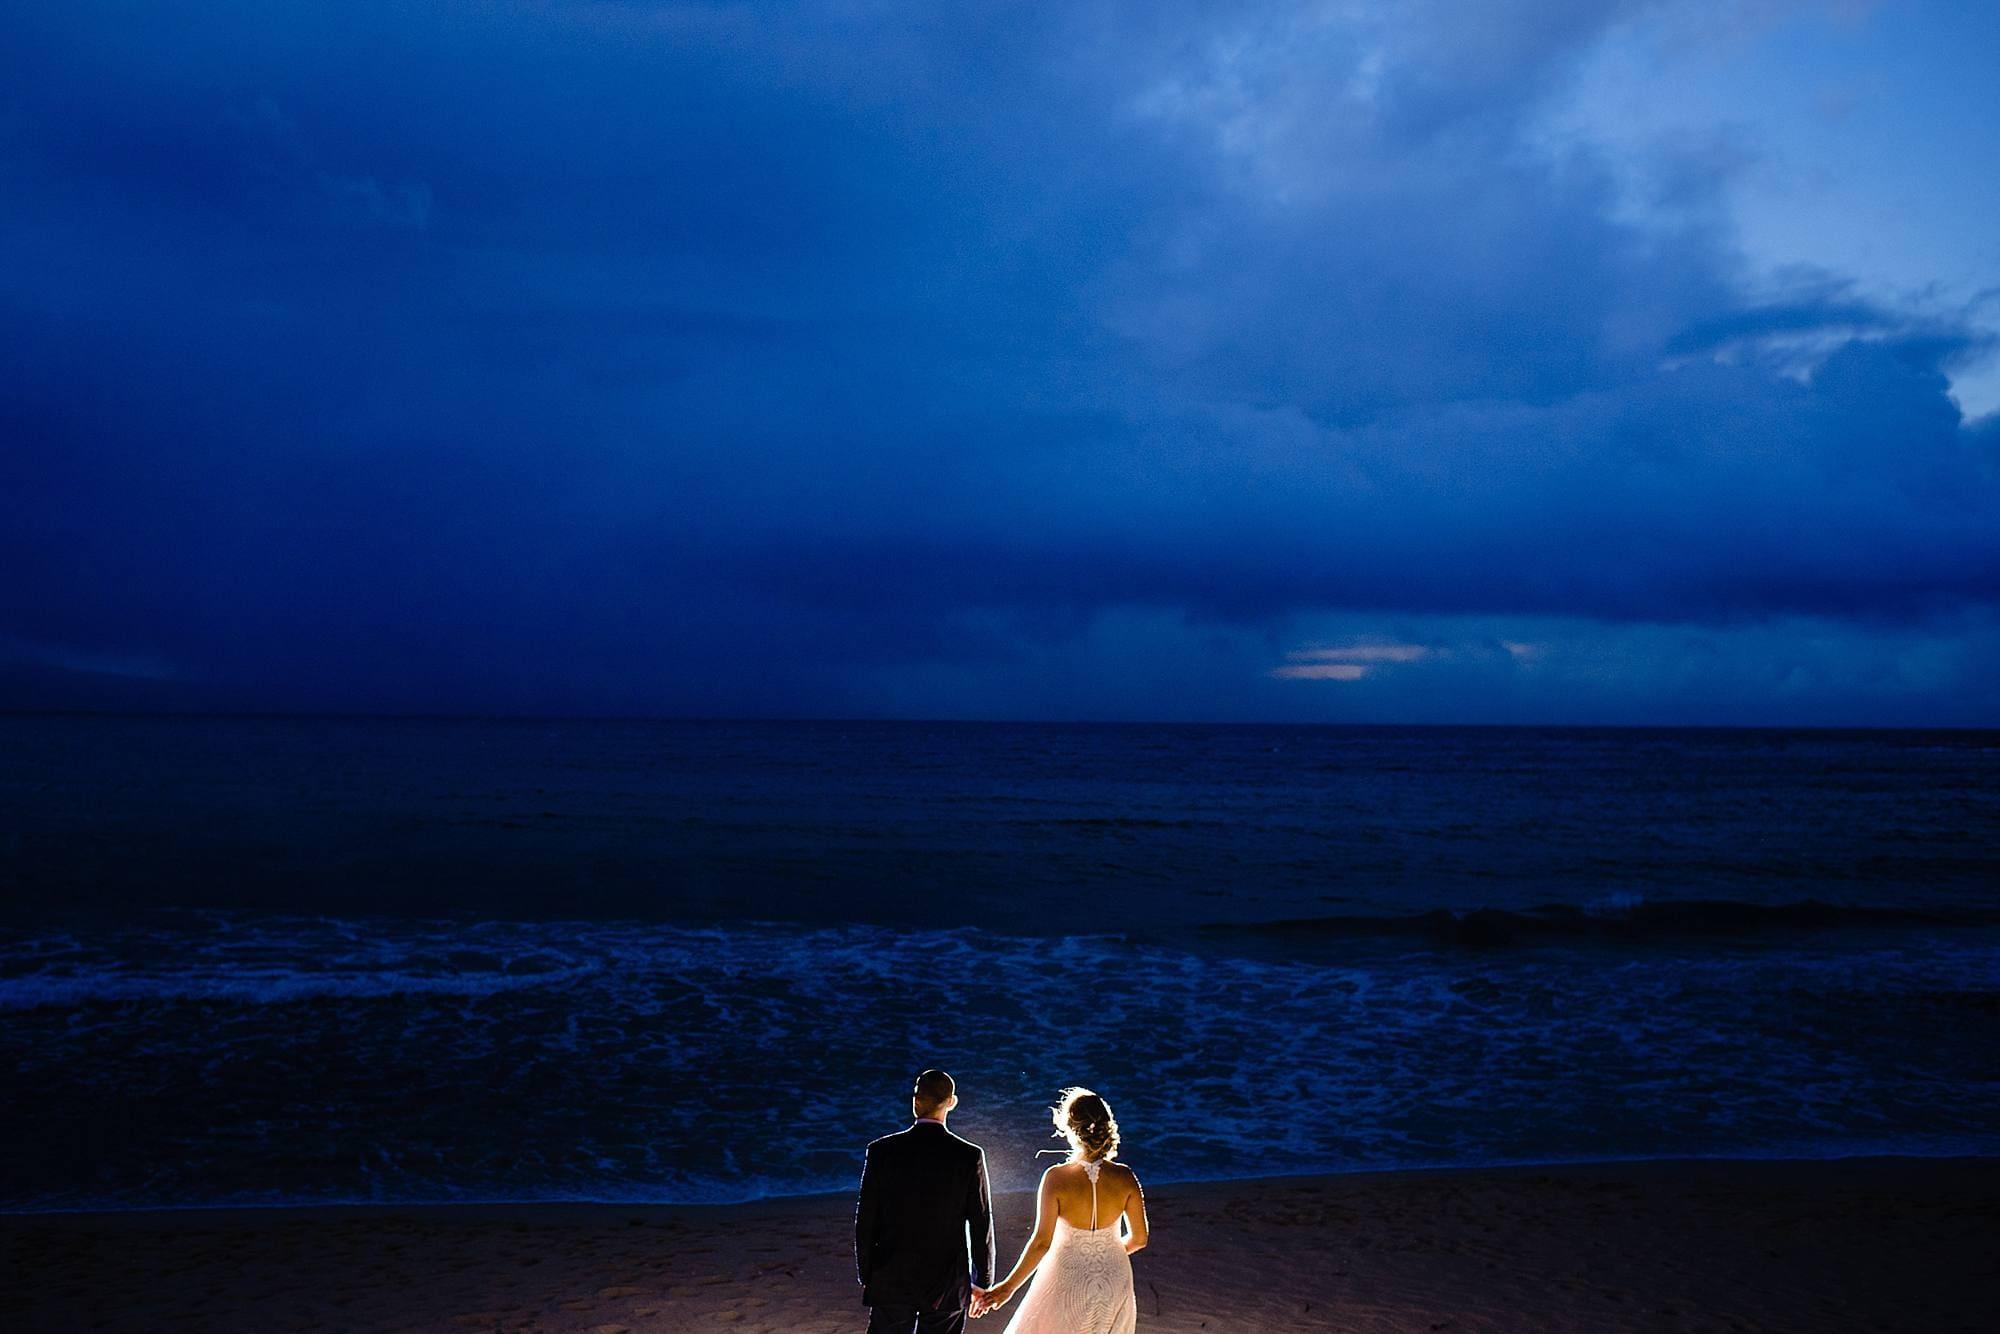 sunset beach shot with backlighting